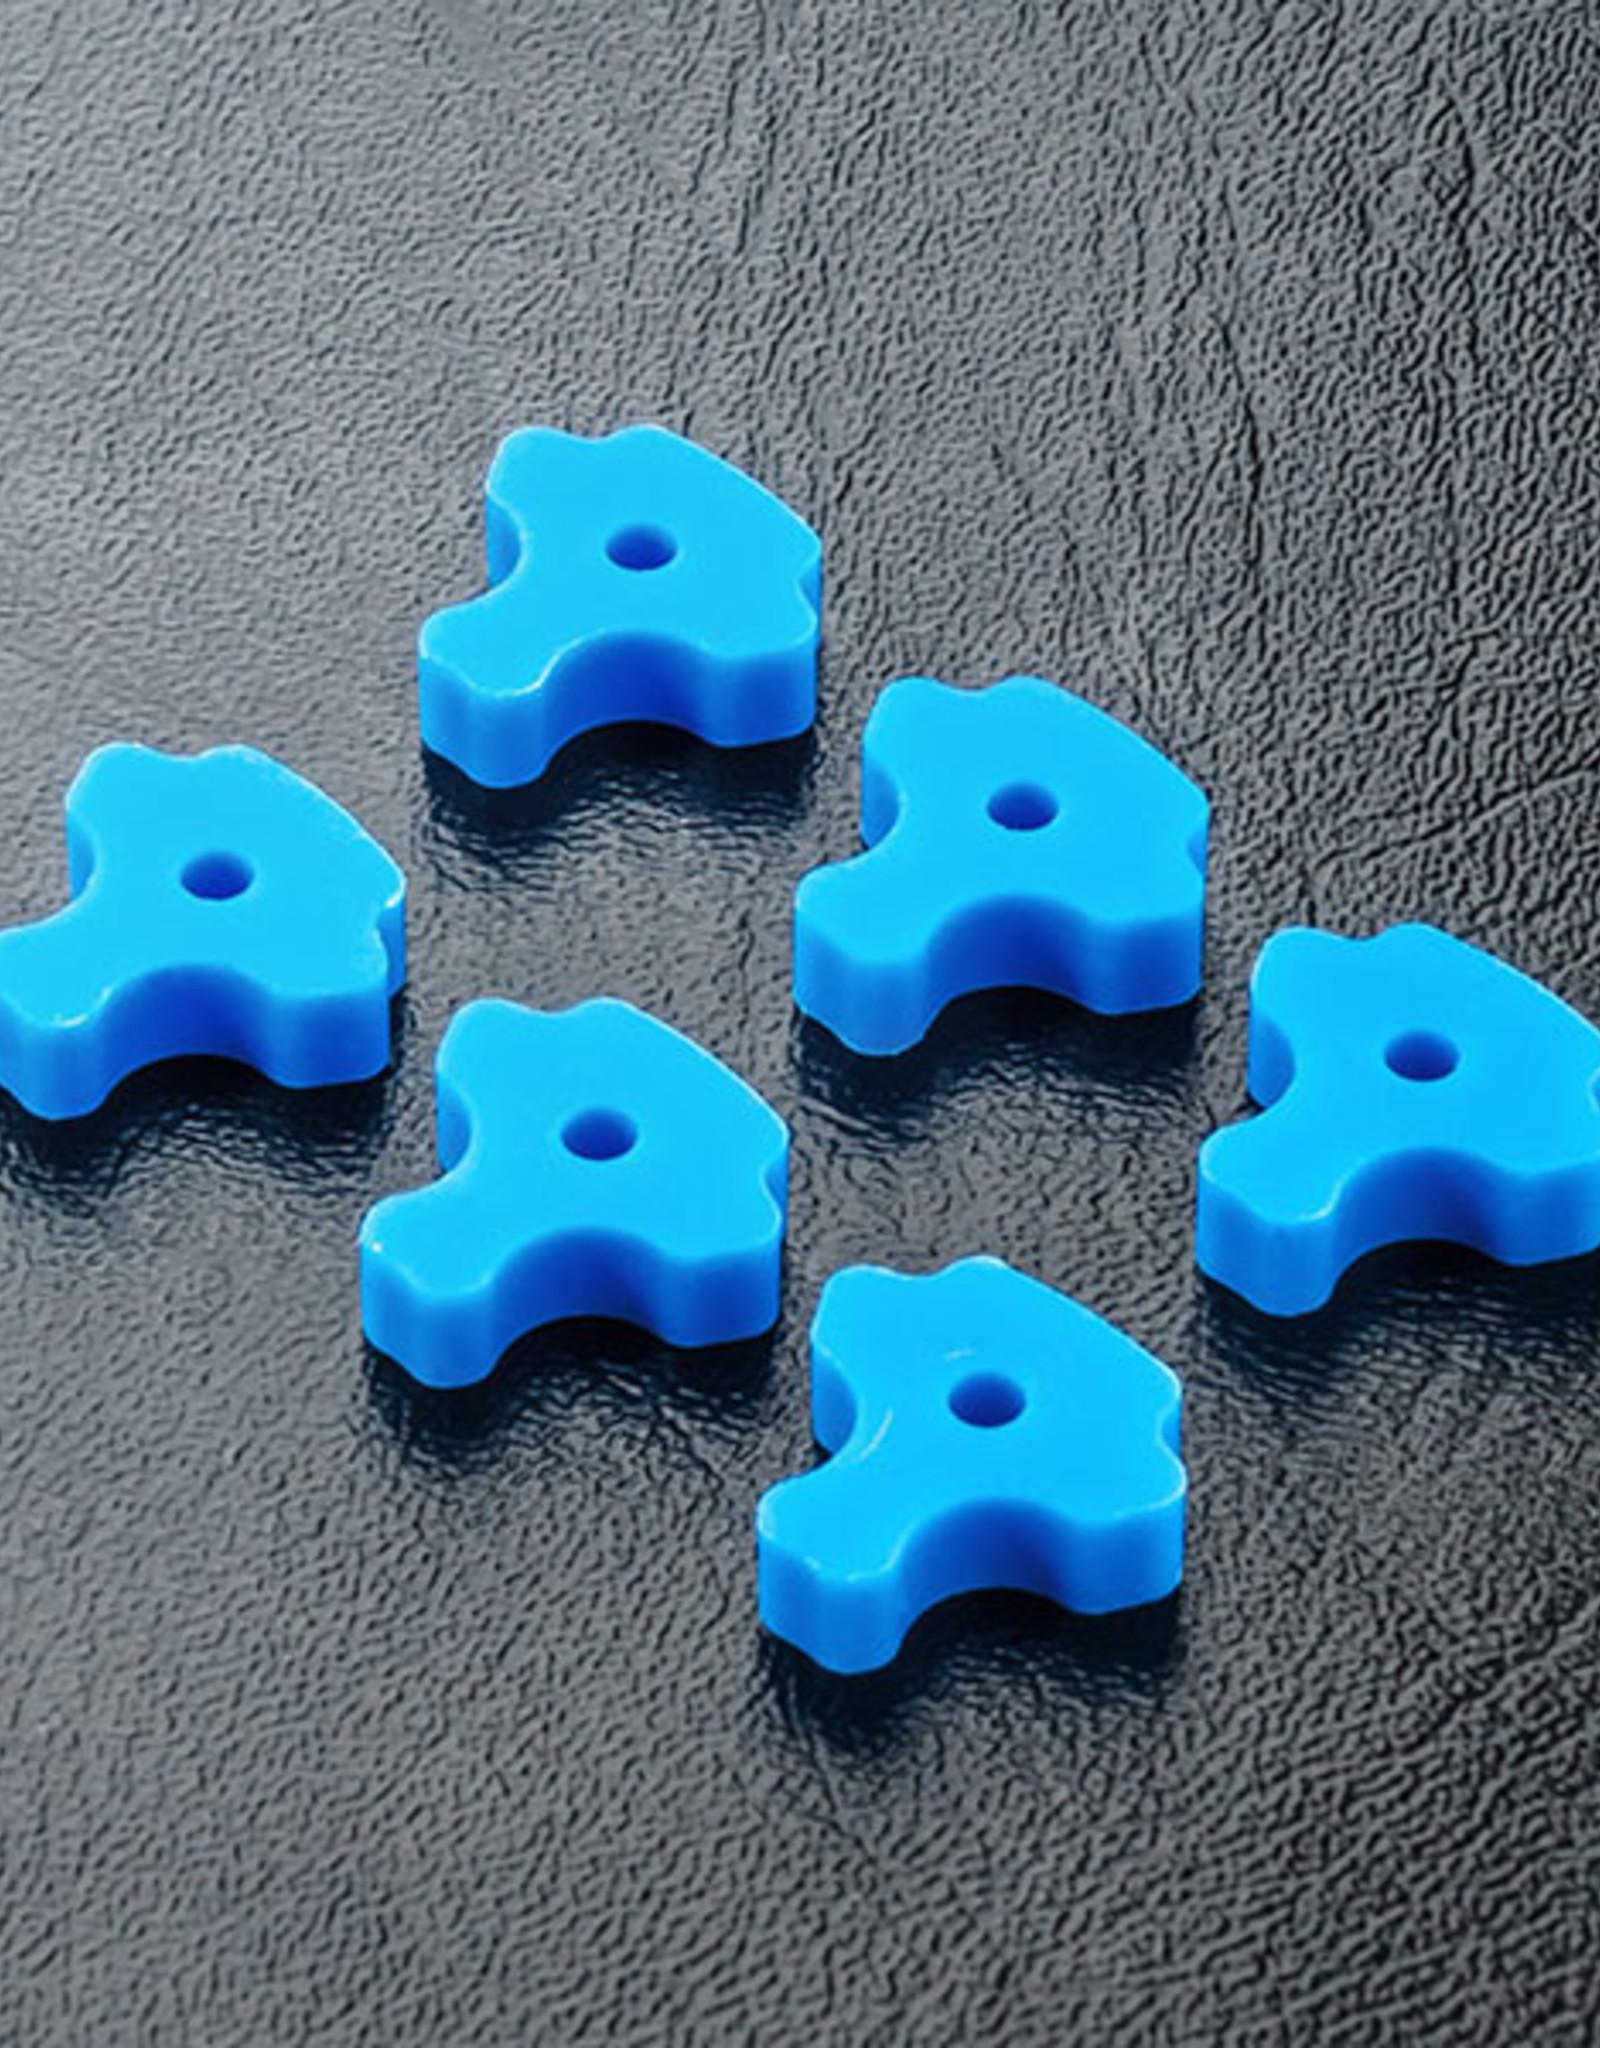 MST MXSPD130050 Cush drive rubber blocks (6) by MST 130050